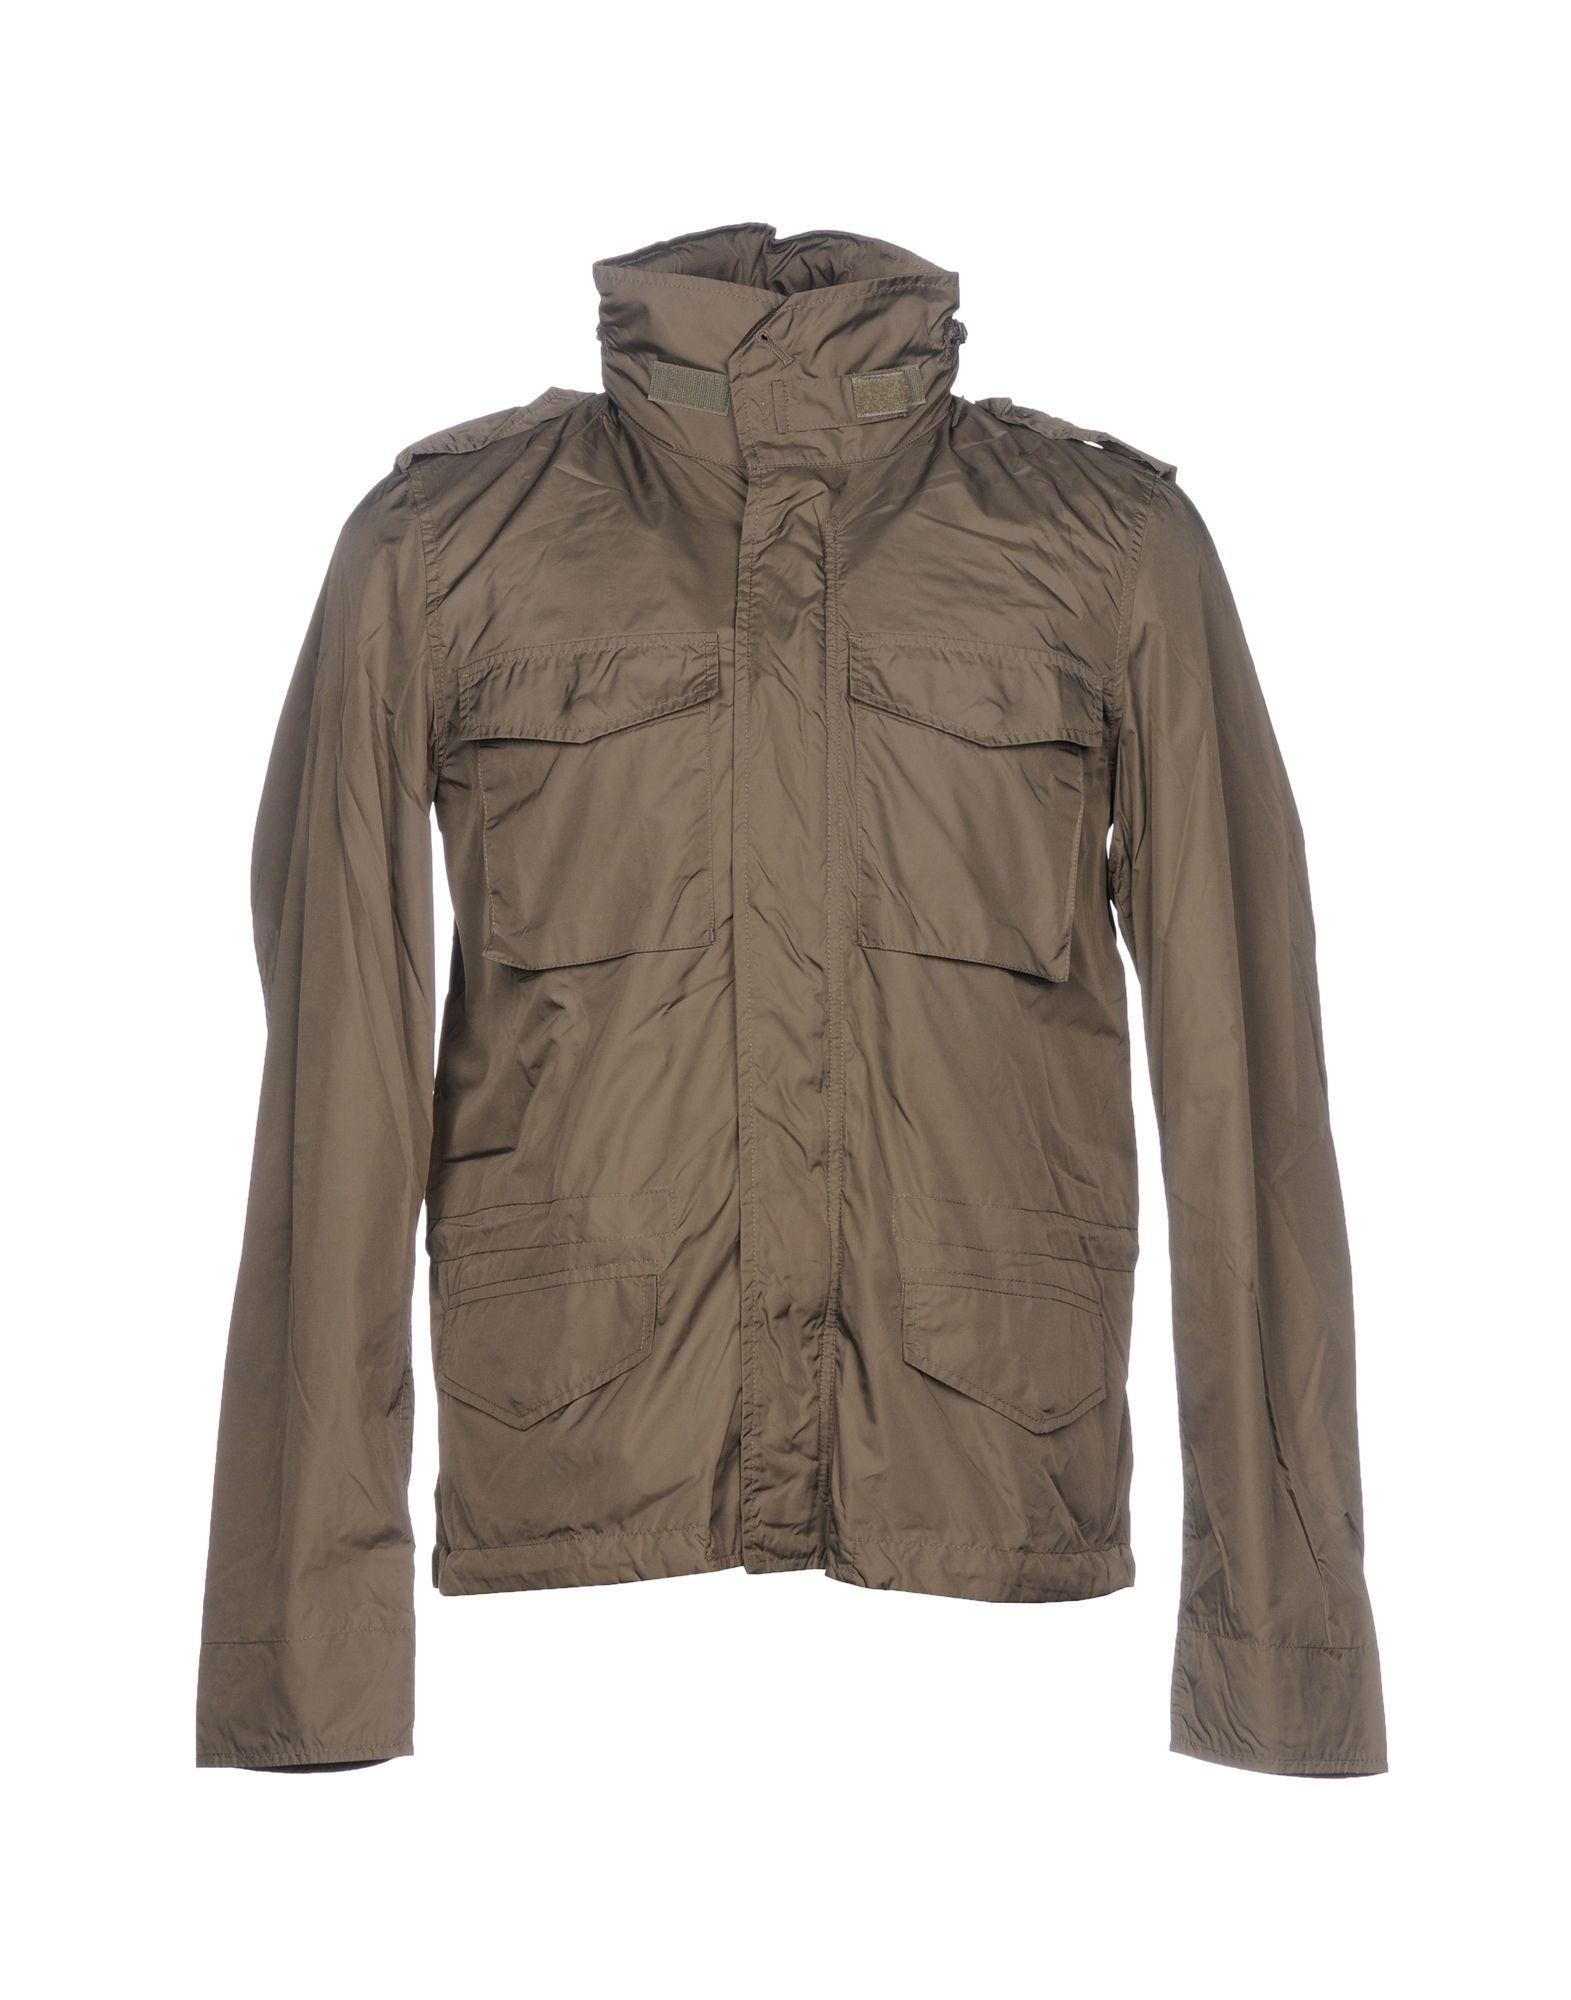 Aspesi Jackets In Khaki